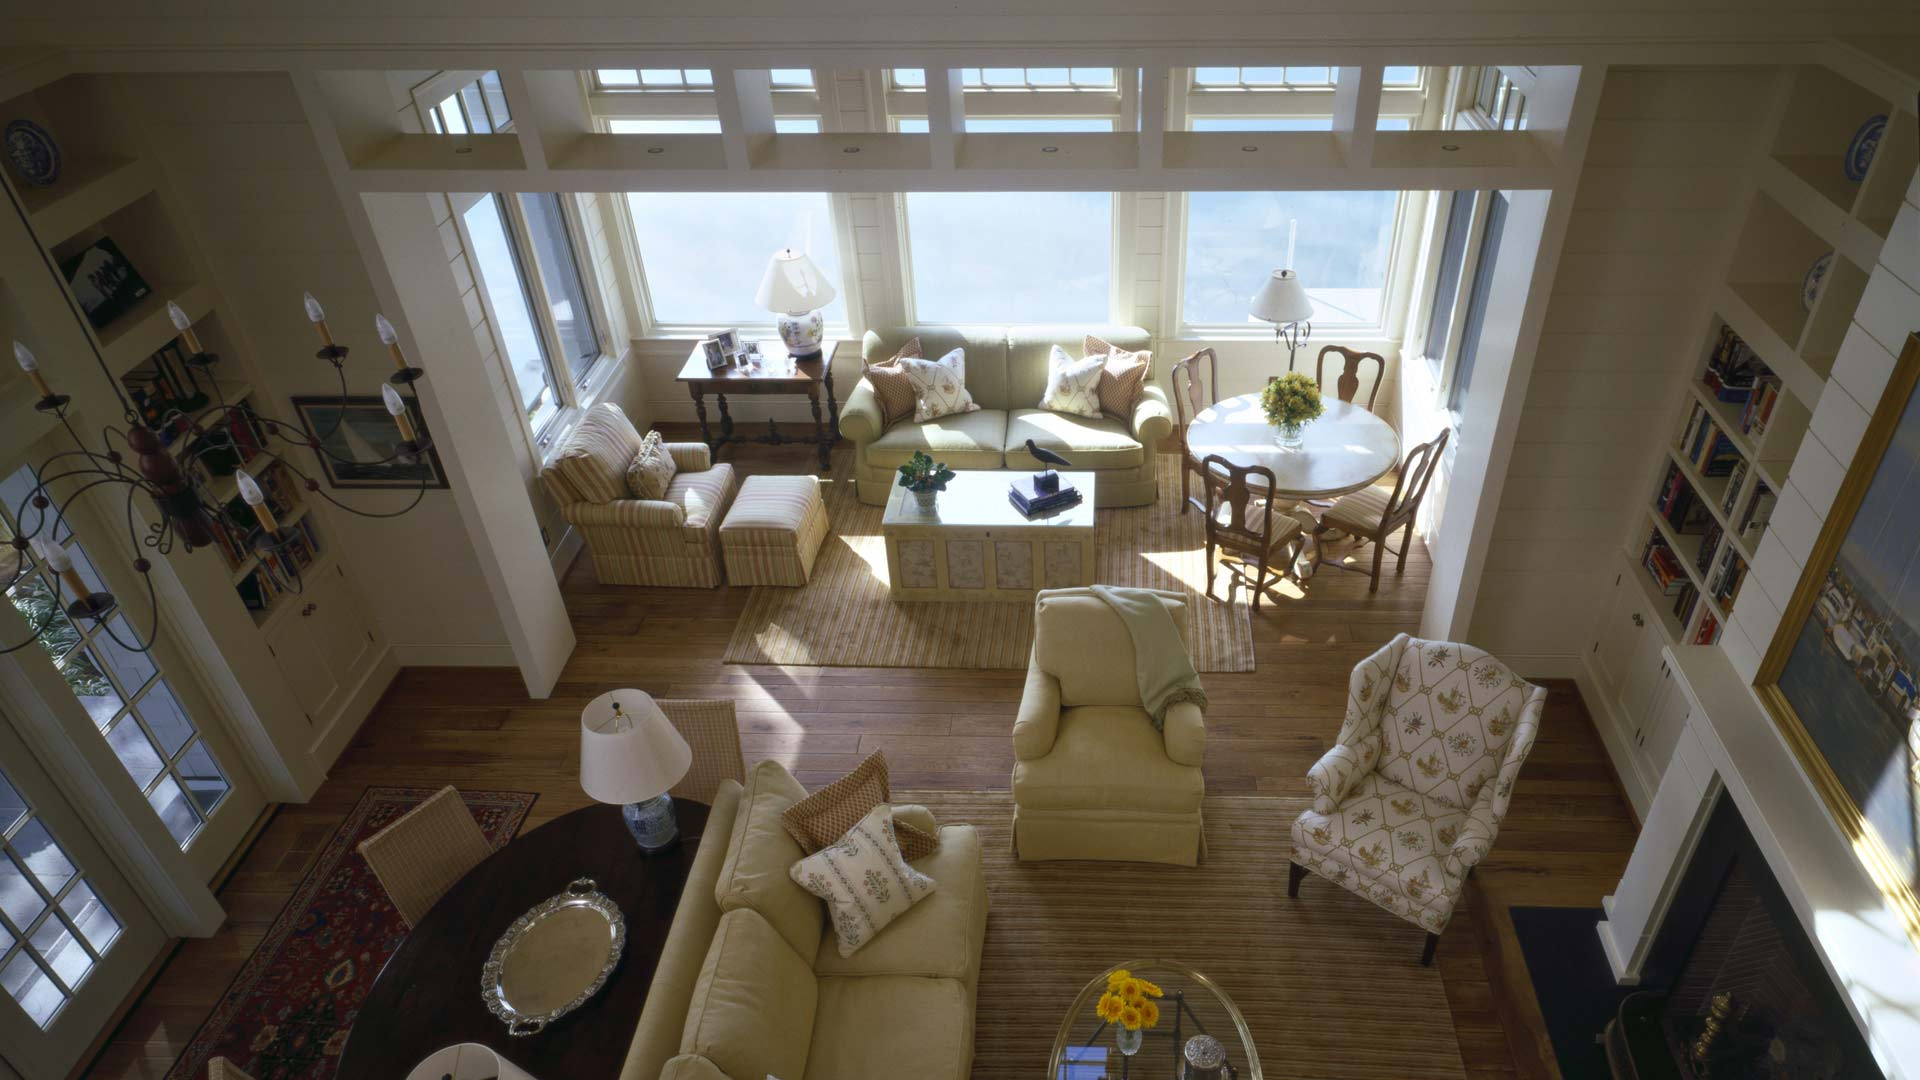 Nantucket Bay Shingle Style - Loft Down View - HAUS Architecture